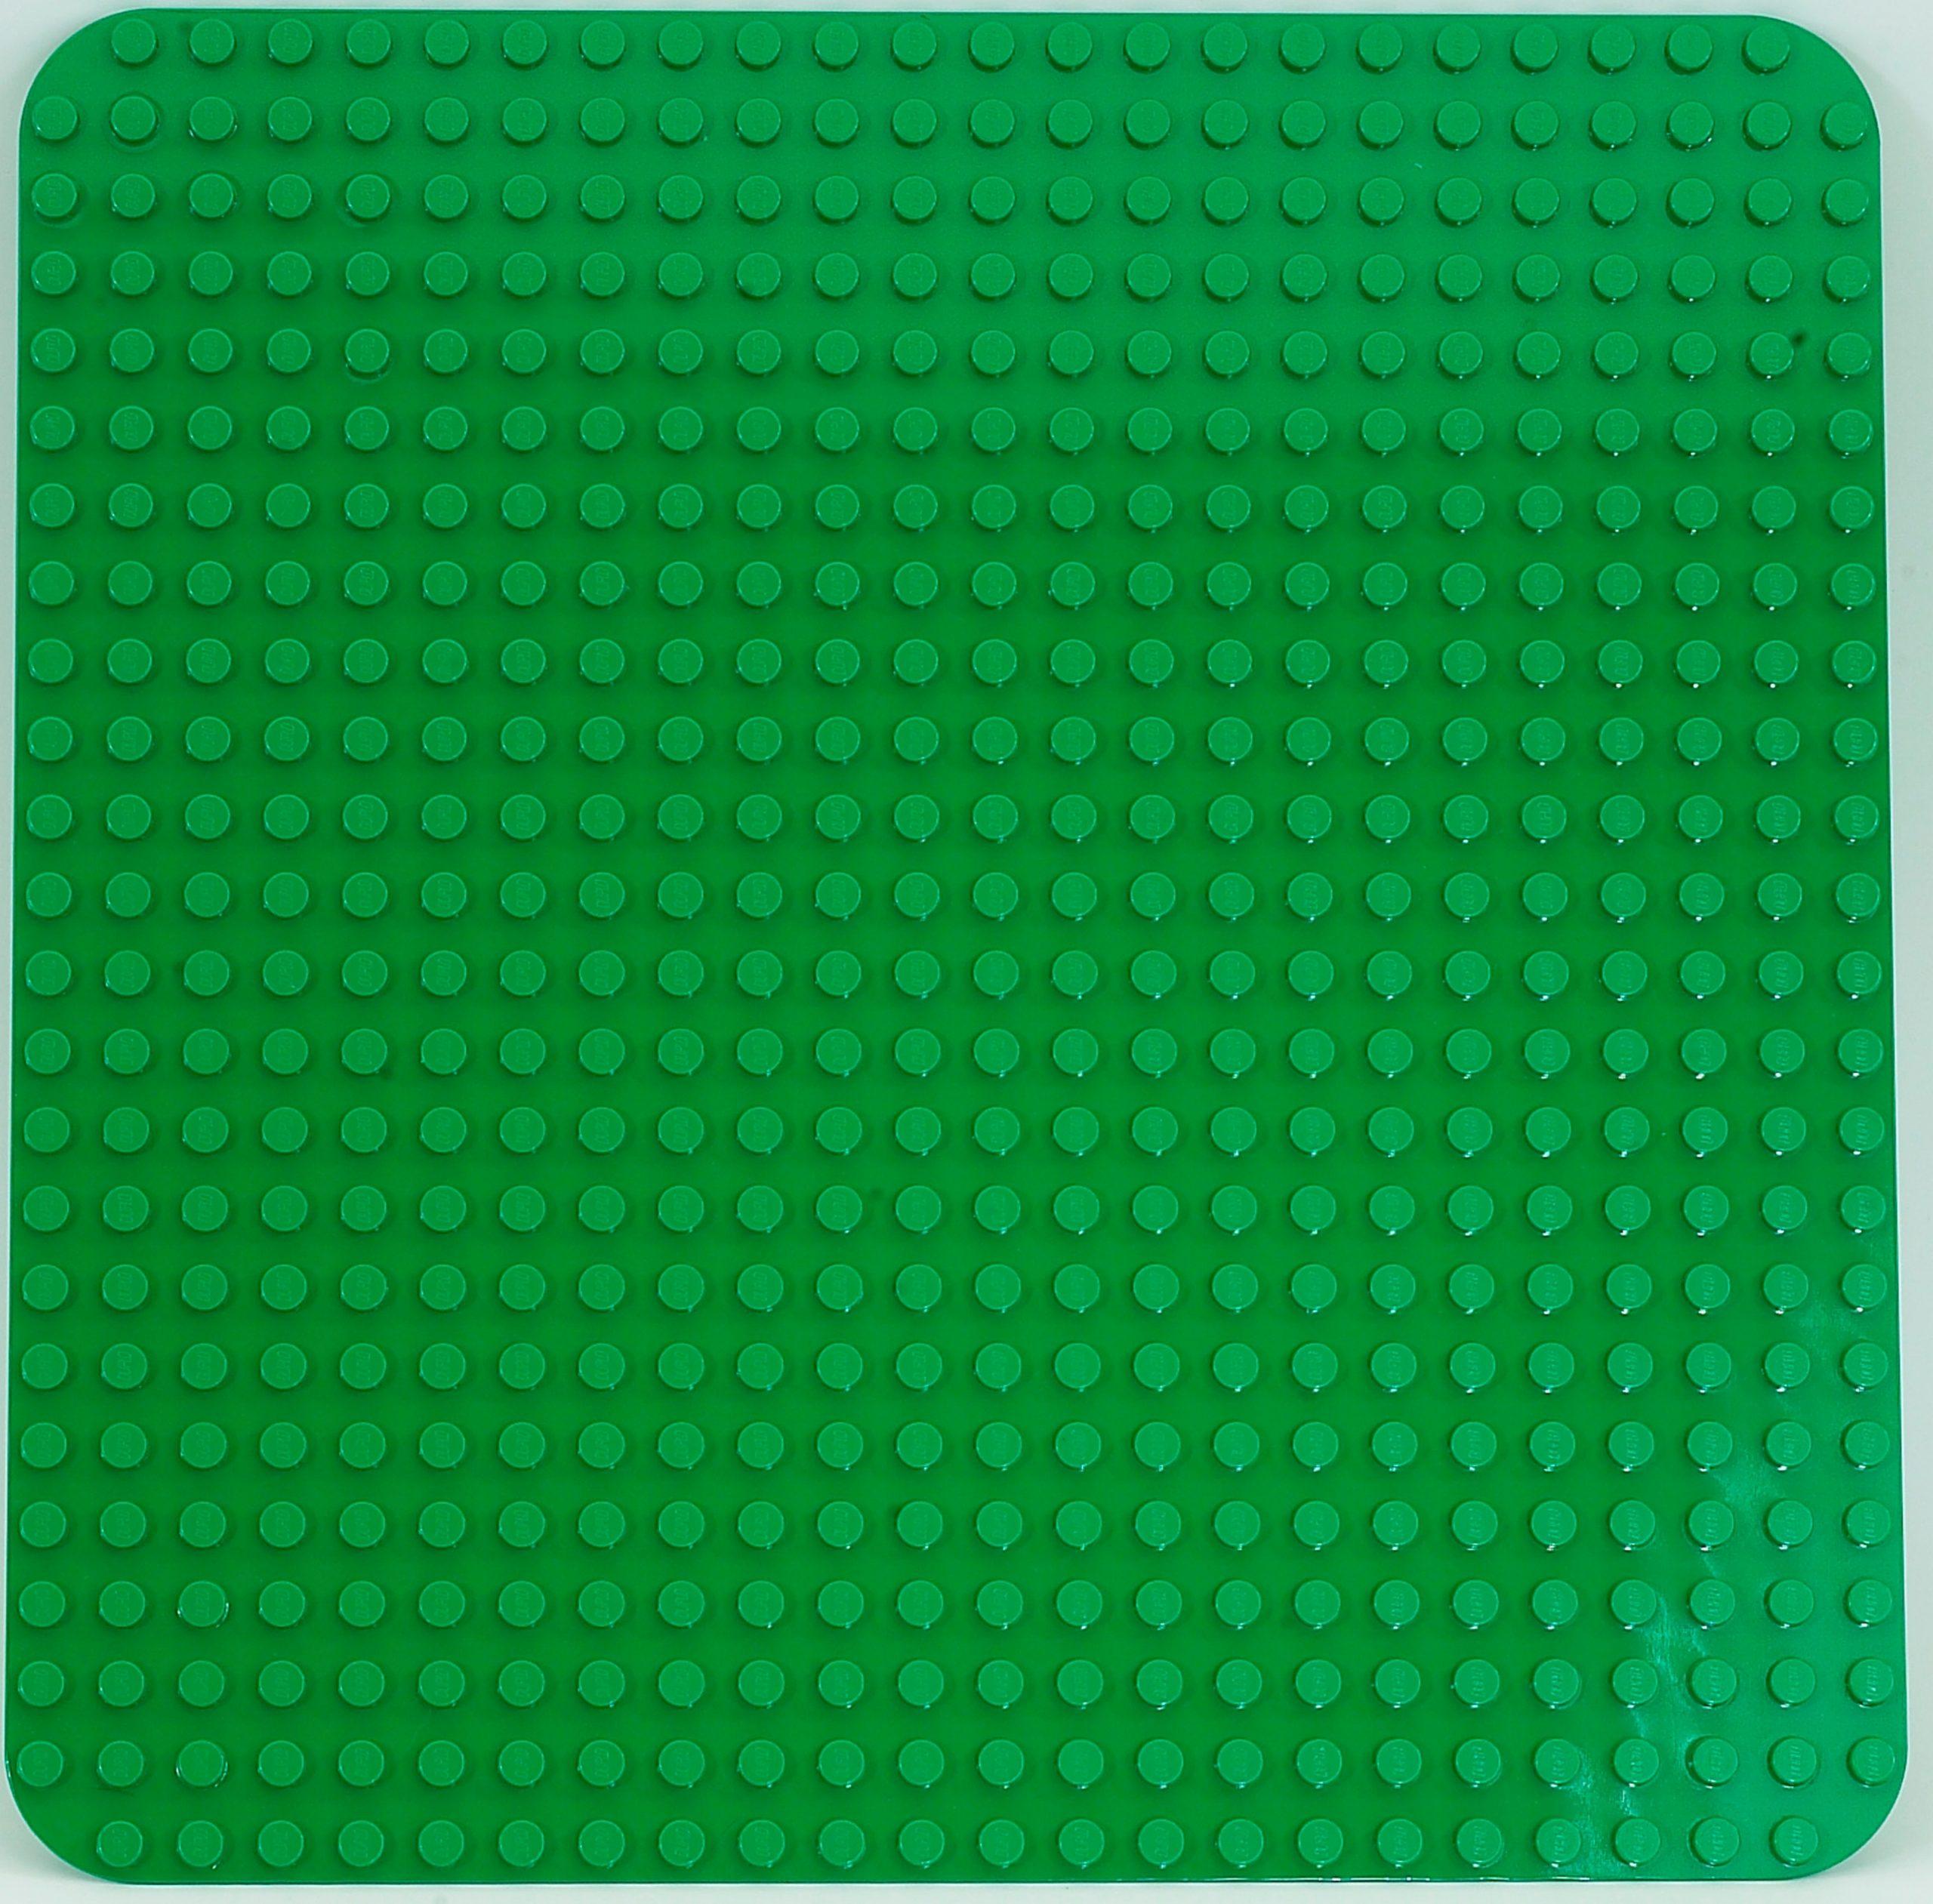 plaque de base lego 2304 duplo 2304 verte scaled